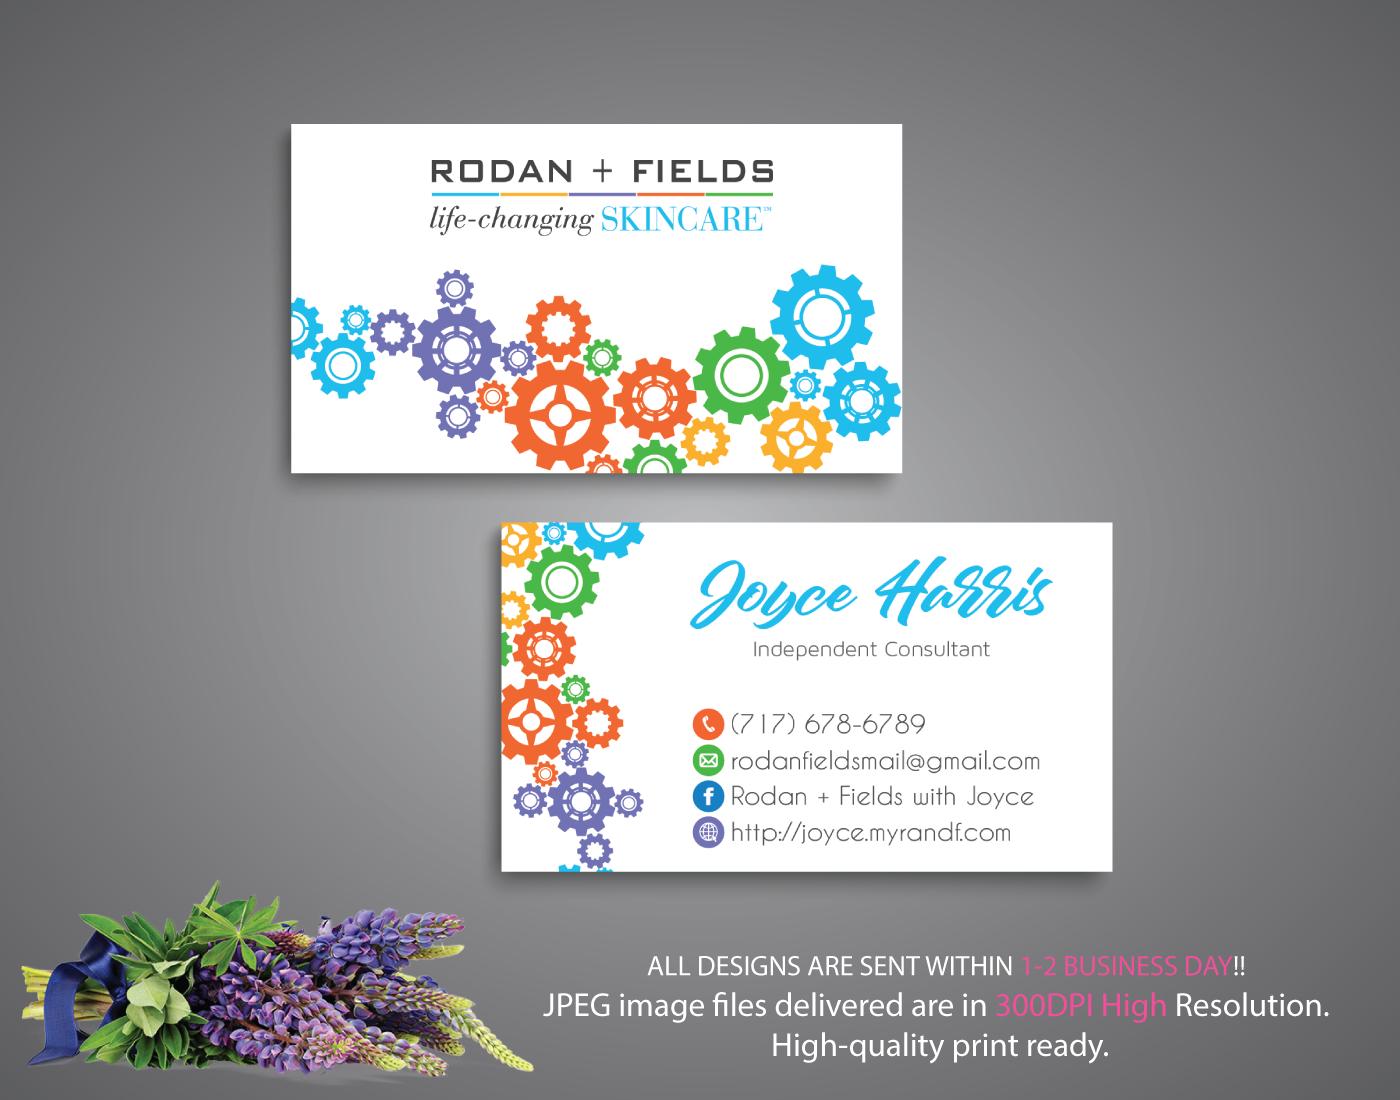 Rodan And Fields Business Cards, Rodan And Fields Digital Files, Rodan +  Fields Printable Card, R And F Marketing Cards, Rf07 Soldelisazone Pertaining To Rodan And Fields Business Card Template